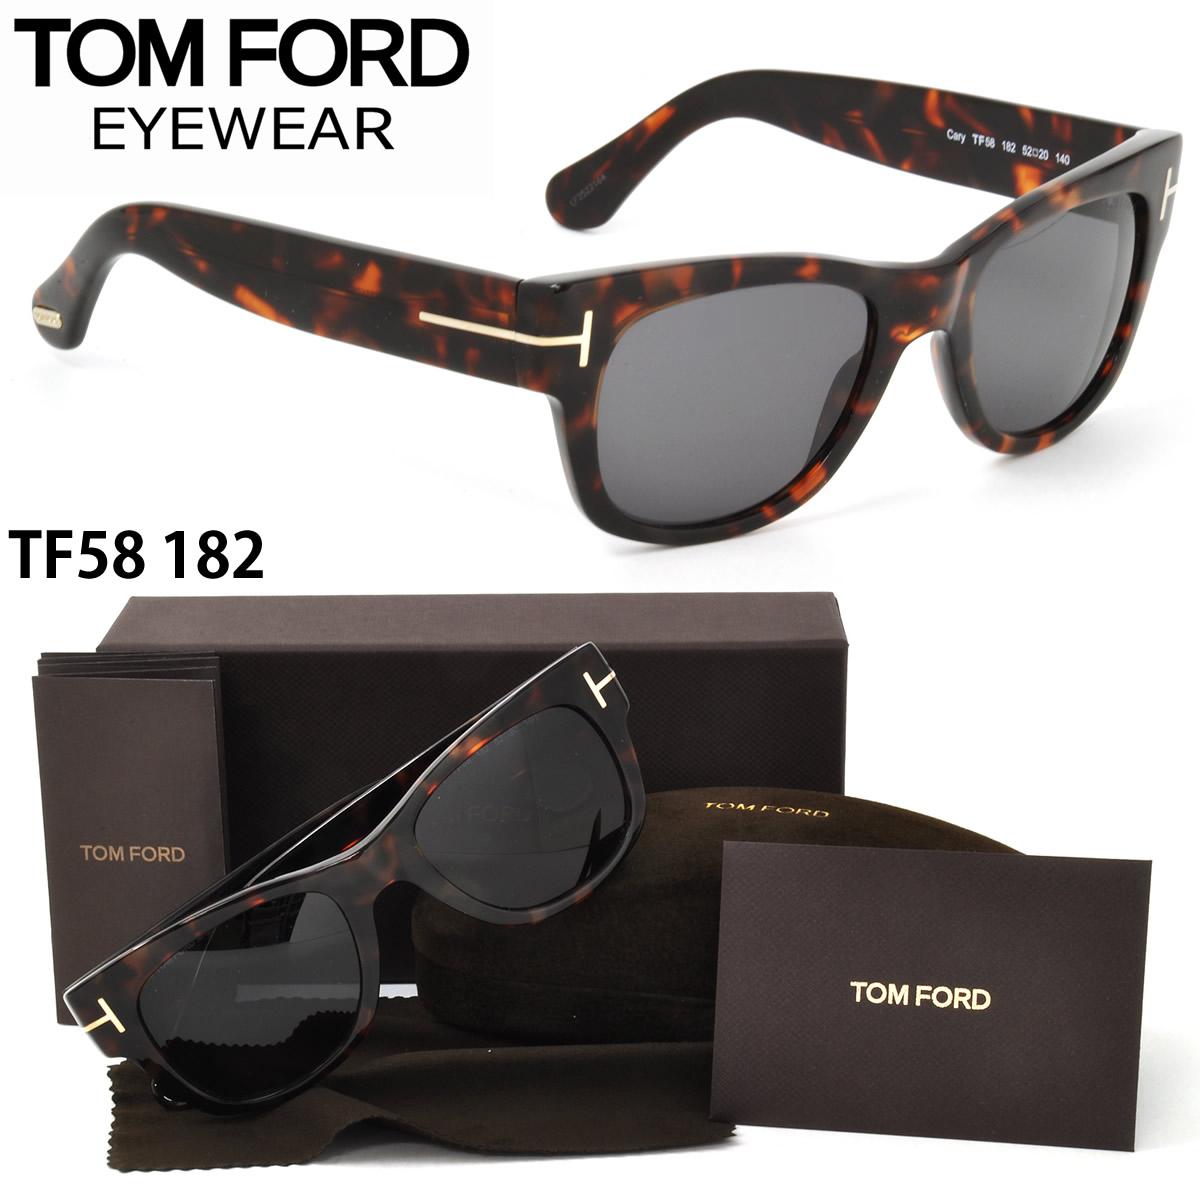 (TOM FORD)太陽眼鏡TF0058 182 52尺寸TOMFORD飛翔距離CARY FT0058格子封條1個服務人分歧D 7d71618cfe70